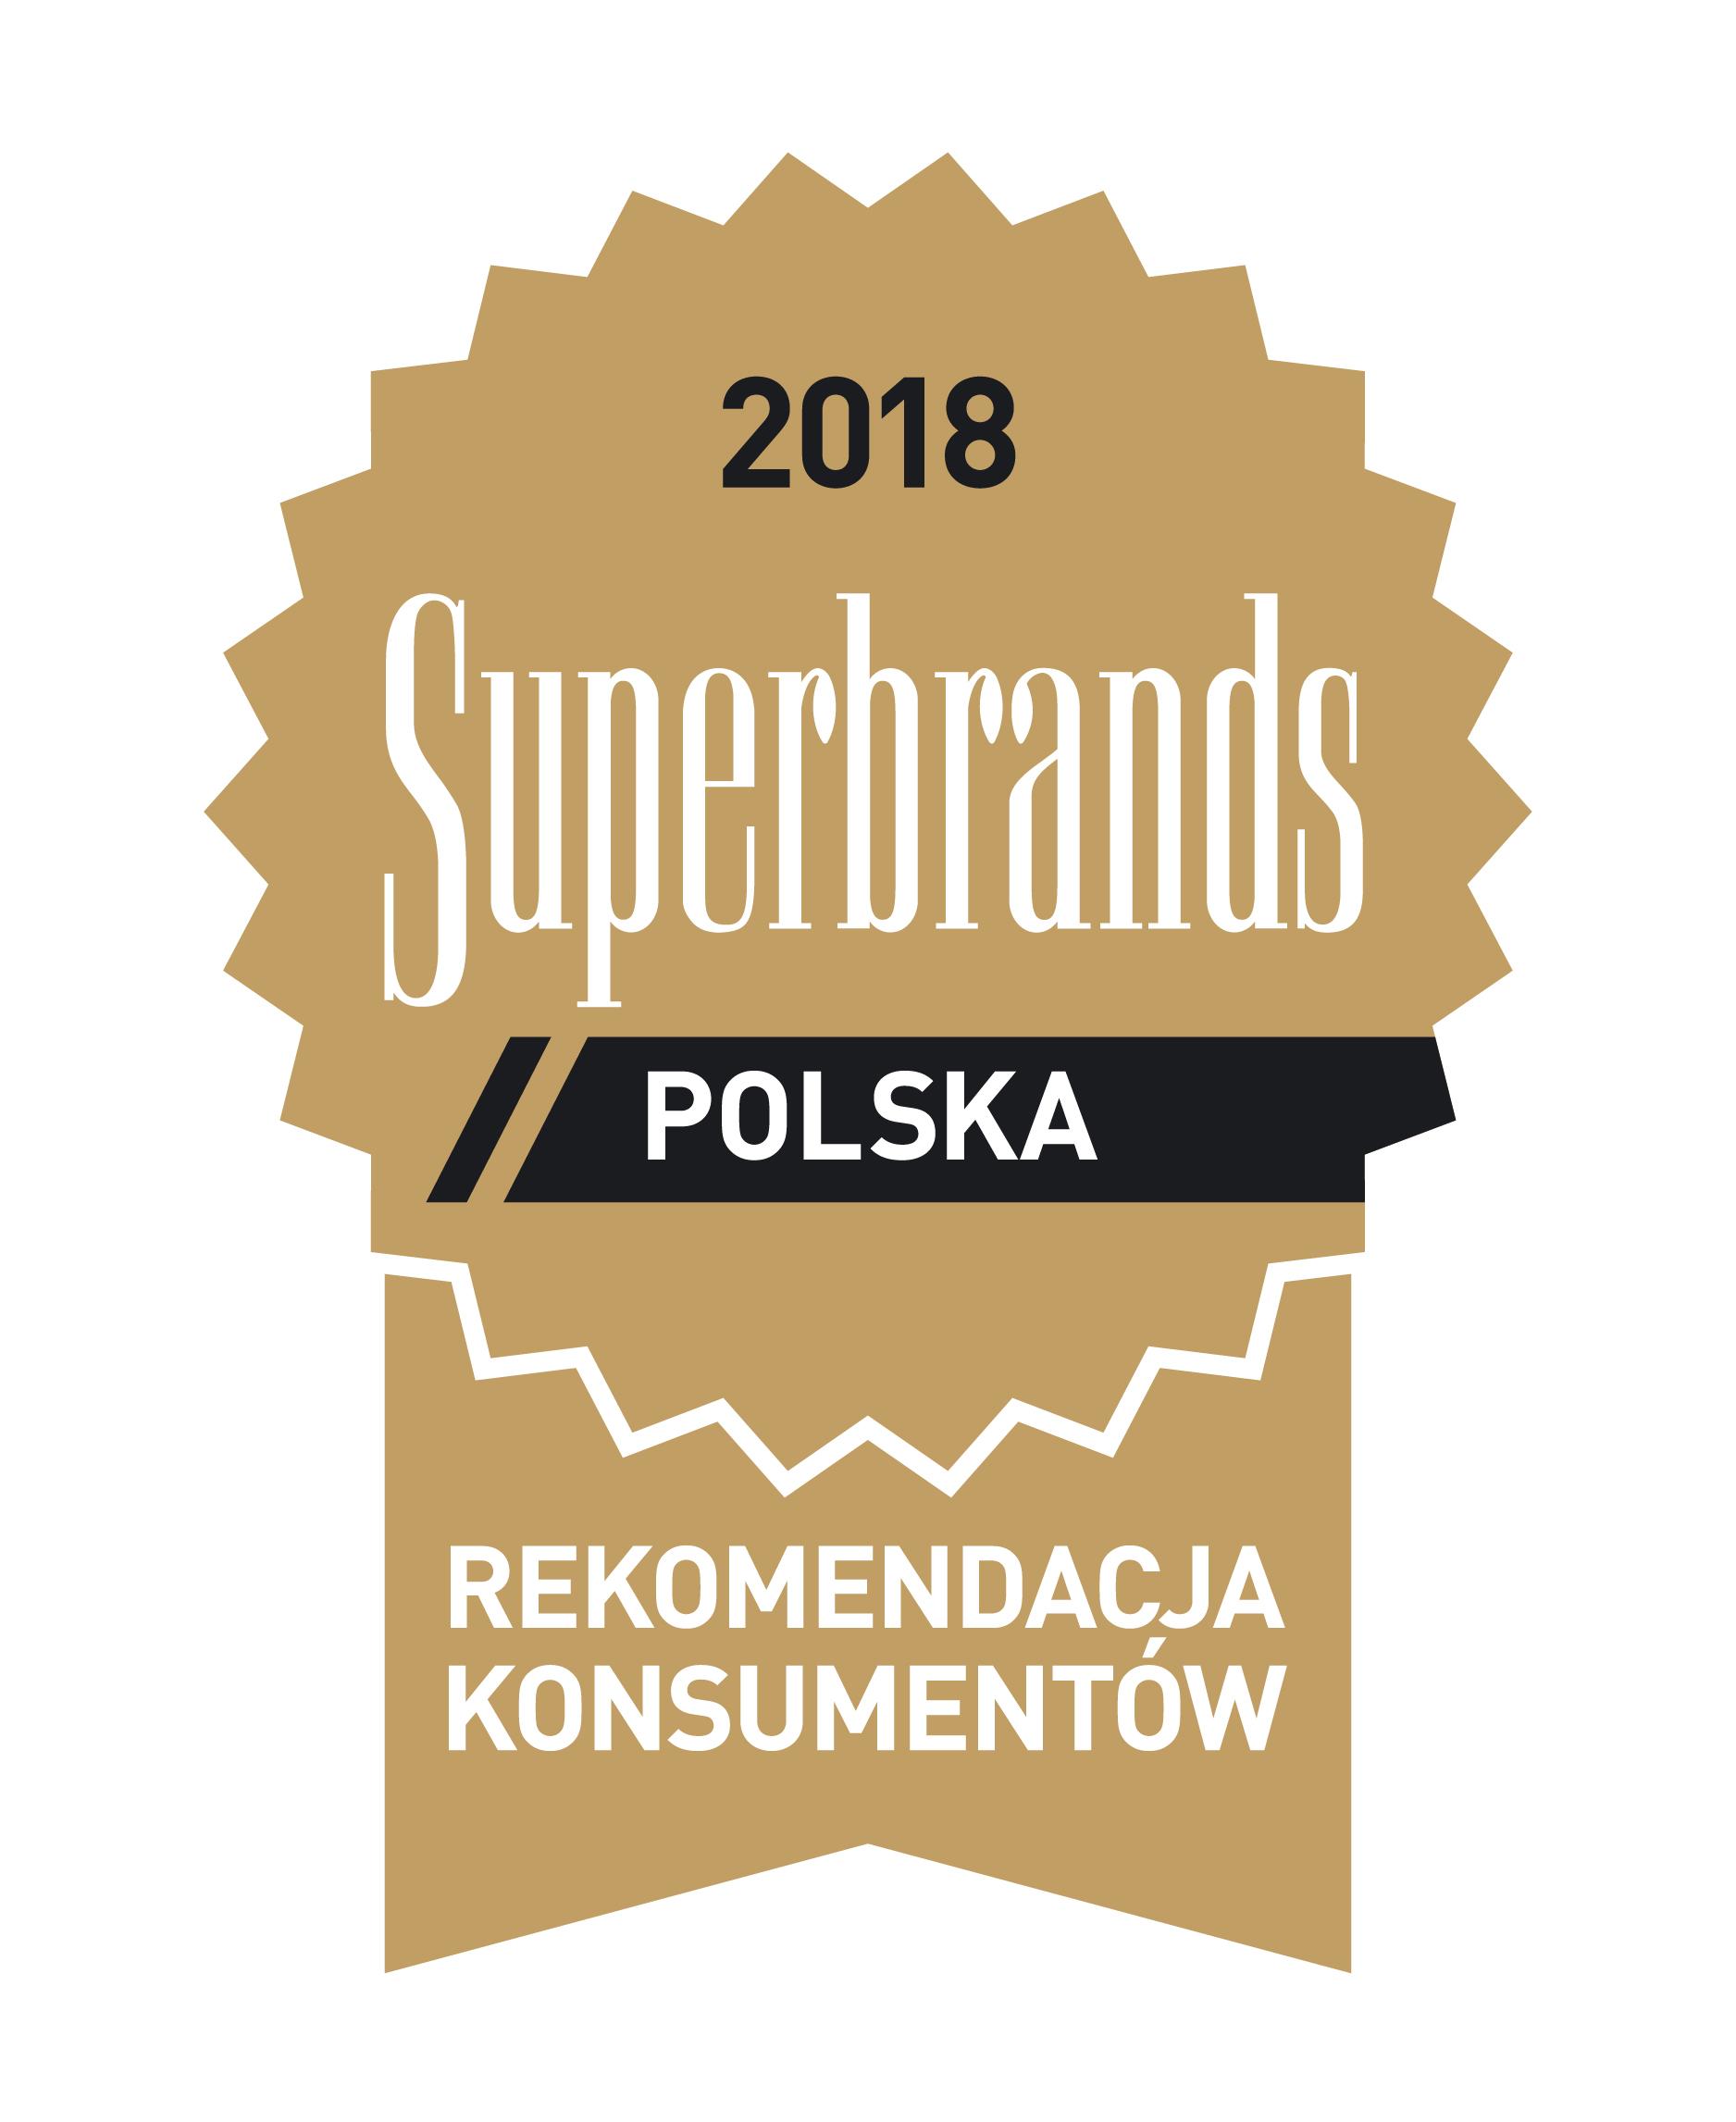 Superbrands_Polska_2018_rekomendacja_konsumentow_logo